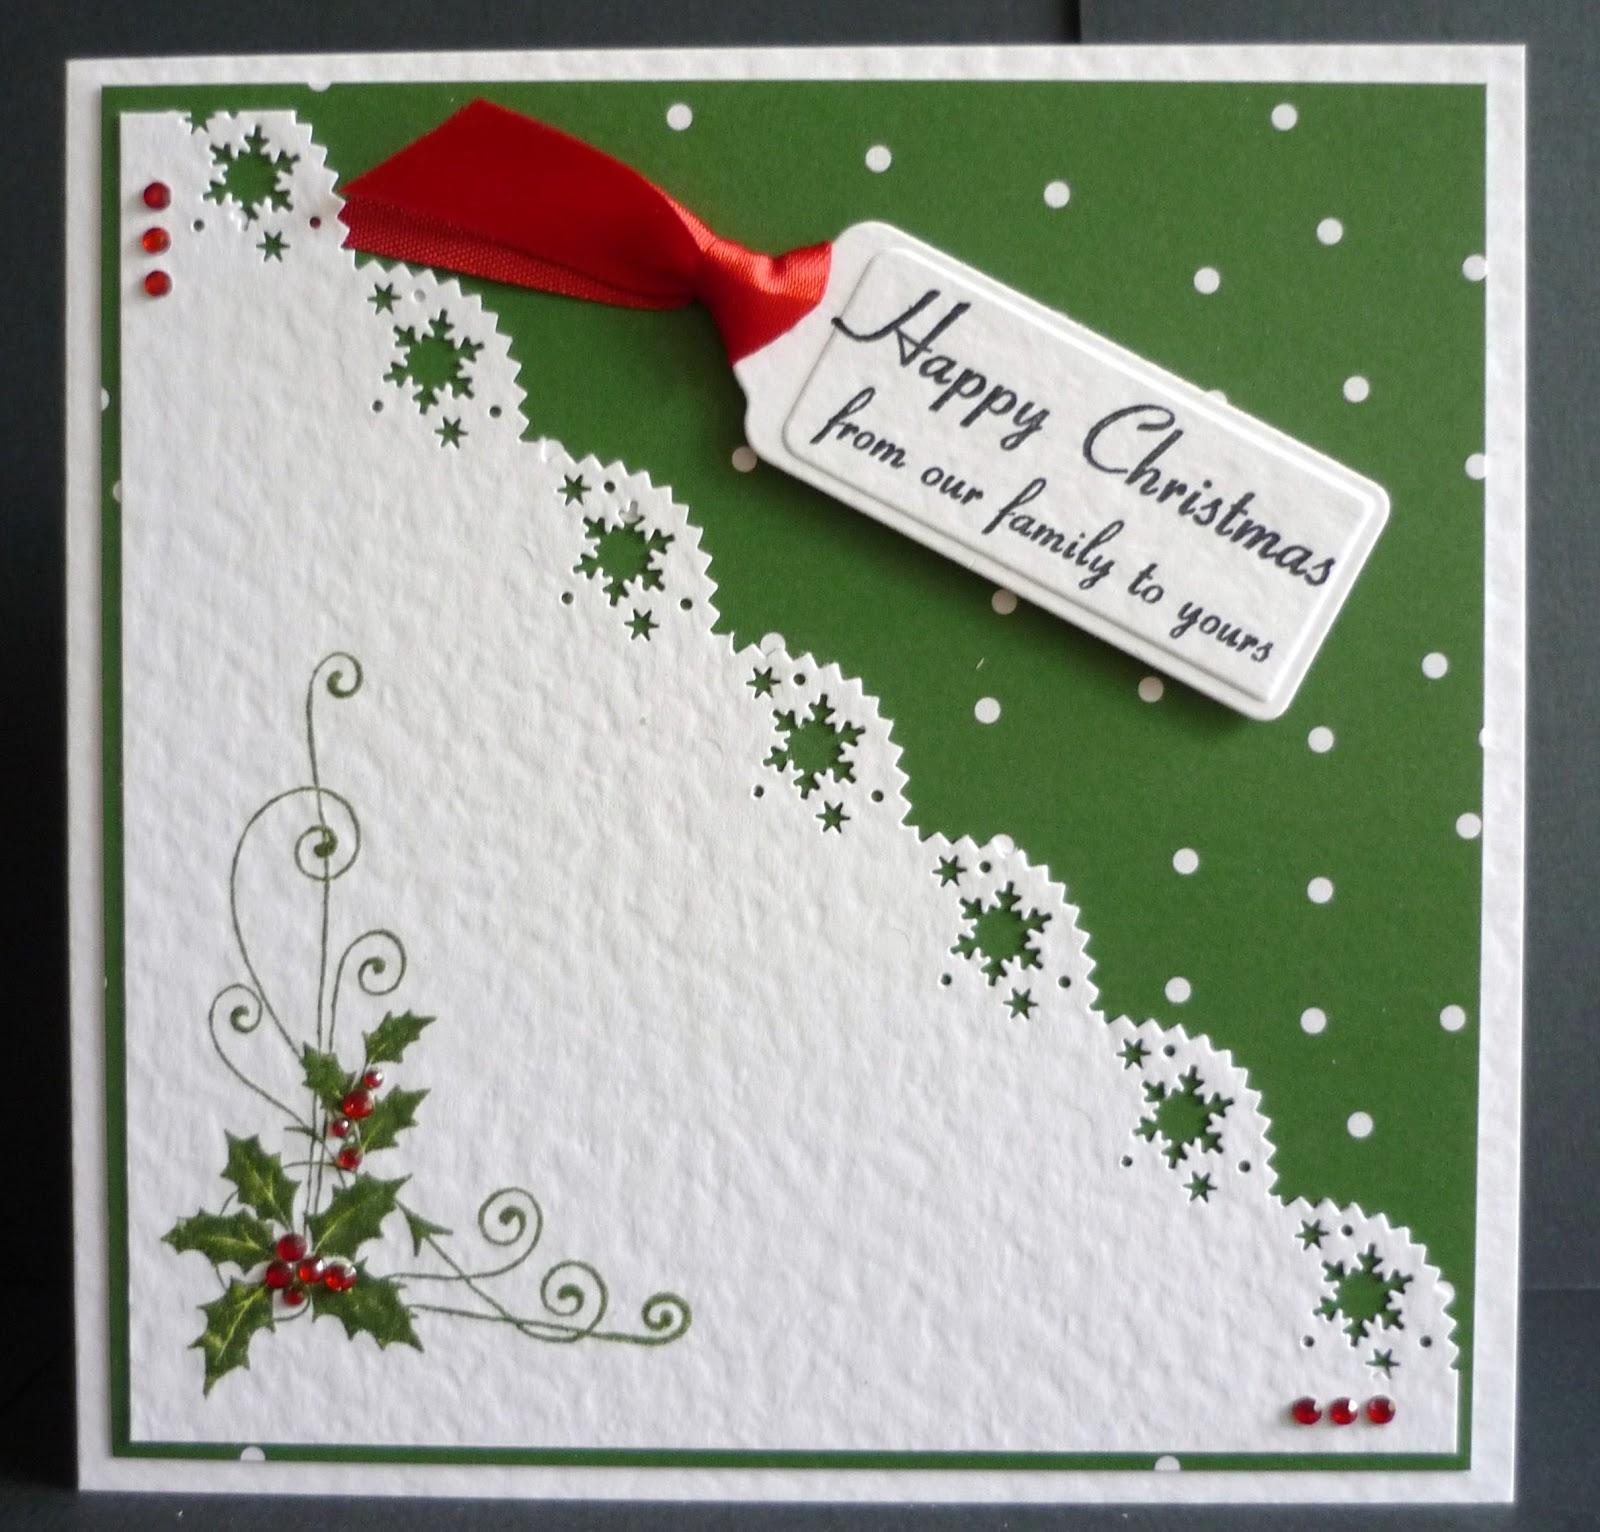 Glitterartird creations by barbara daines more card creations by barbara daines more simple christmas cards kristyandbryce Gallery